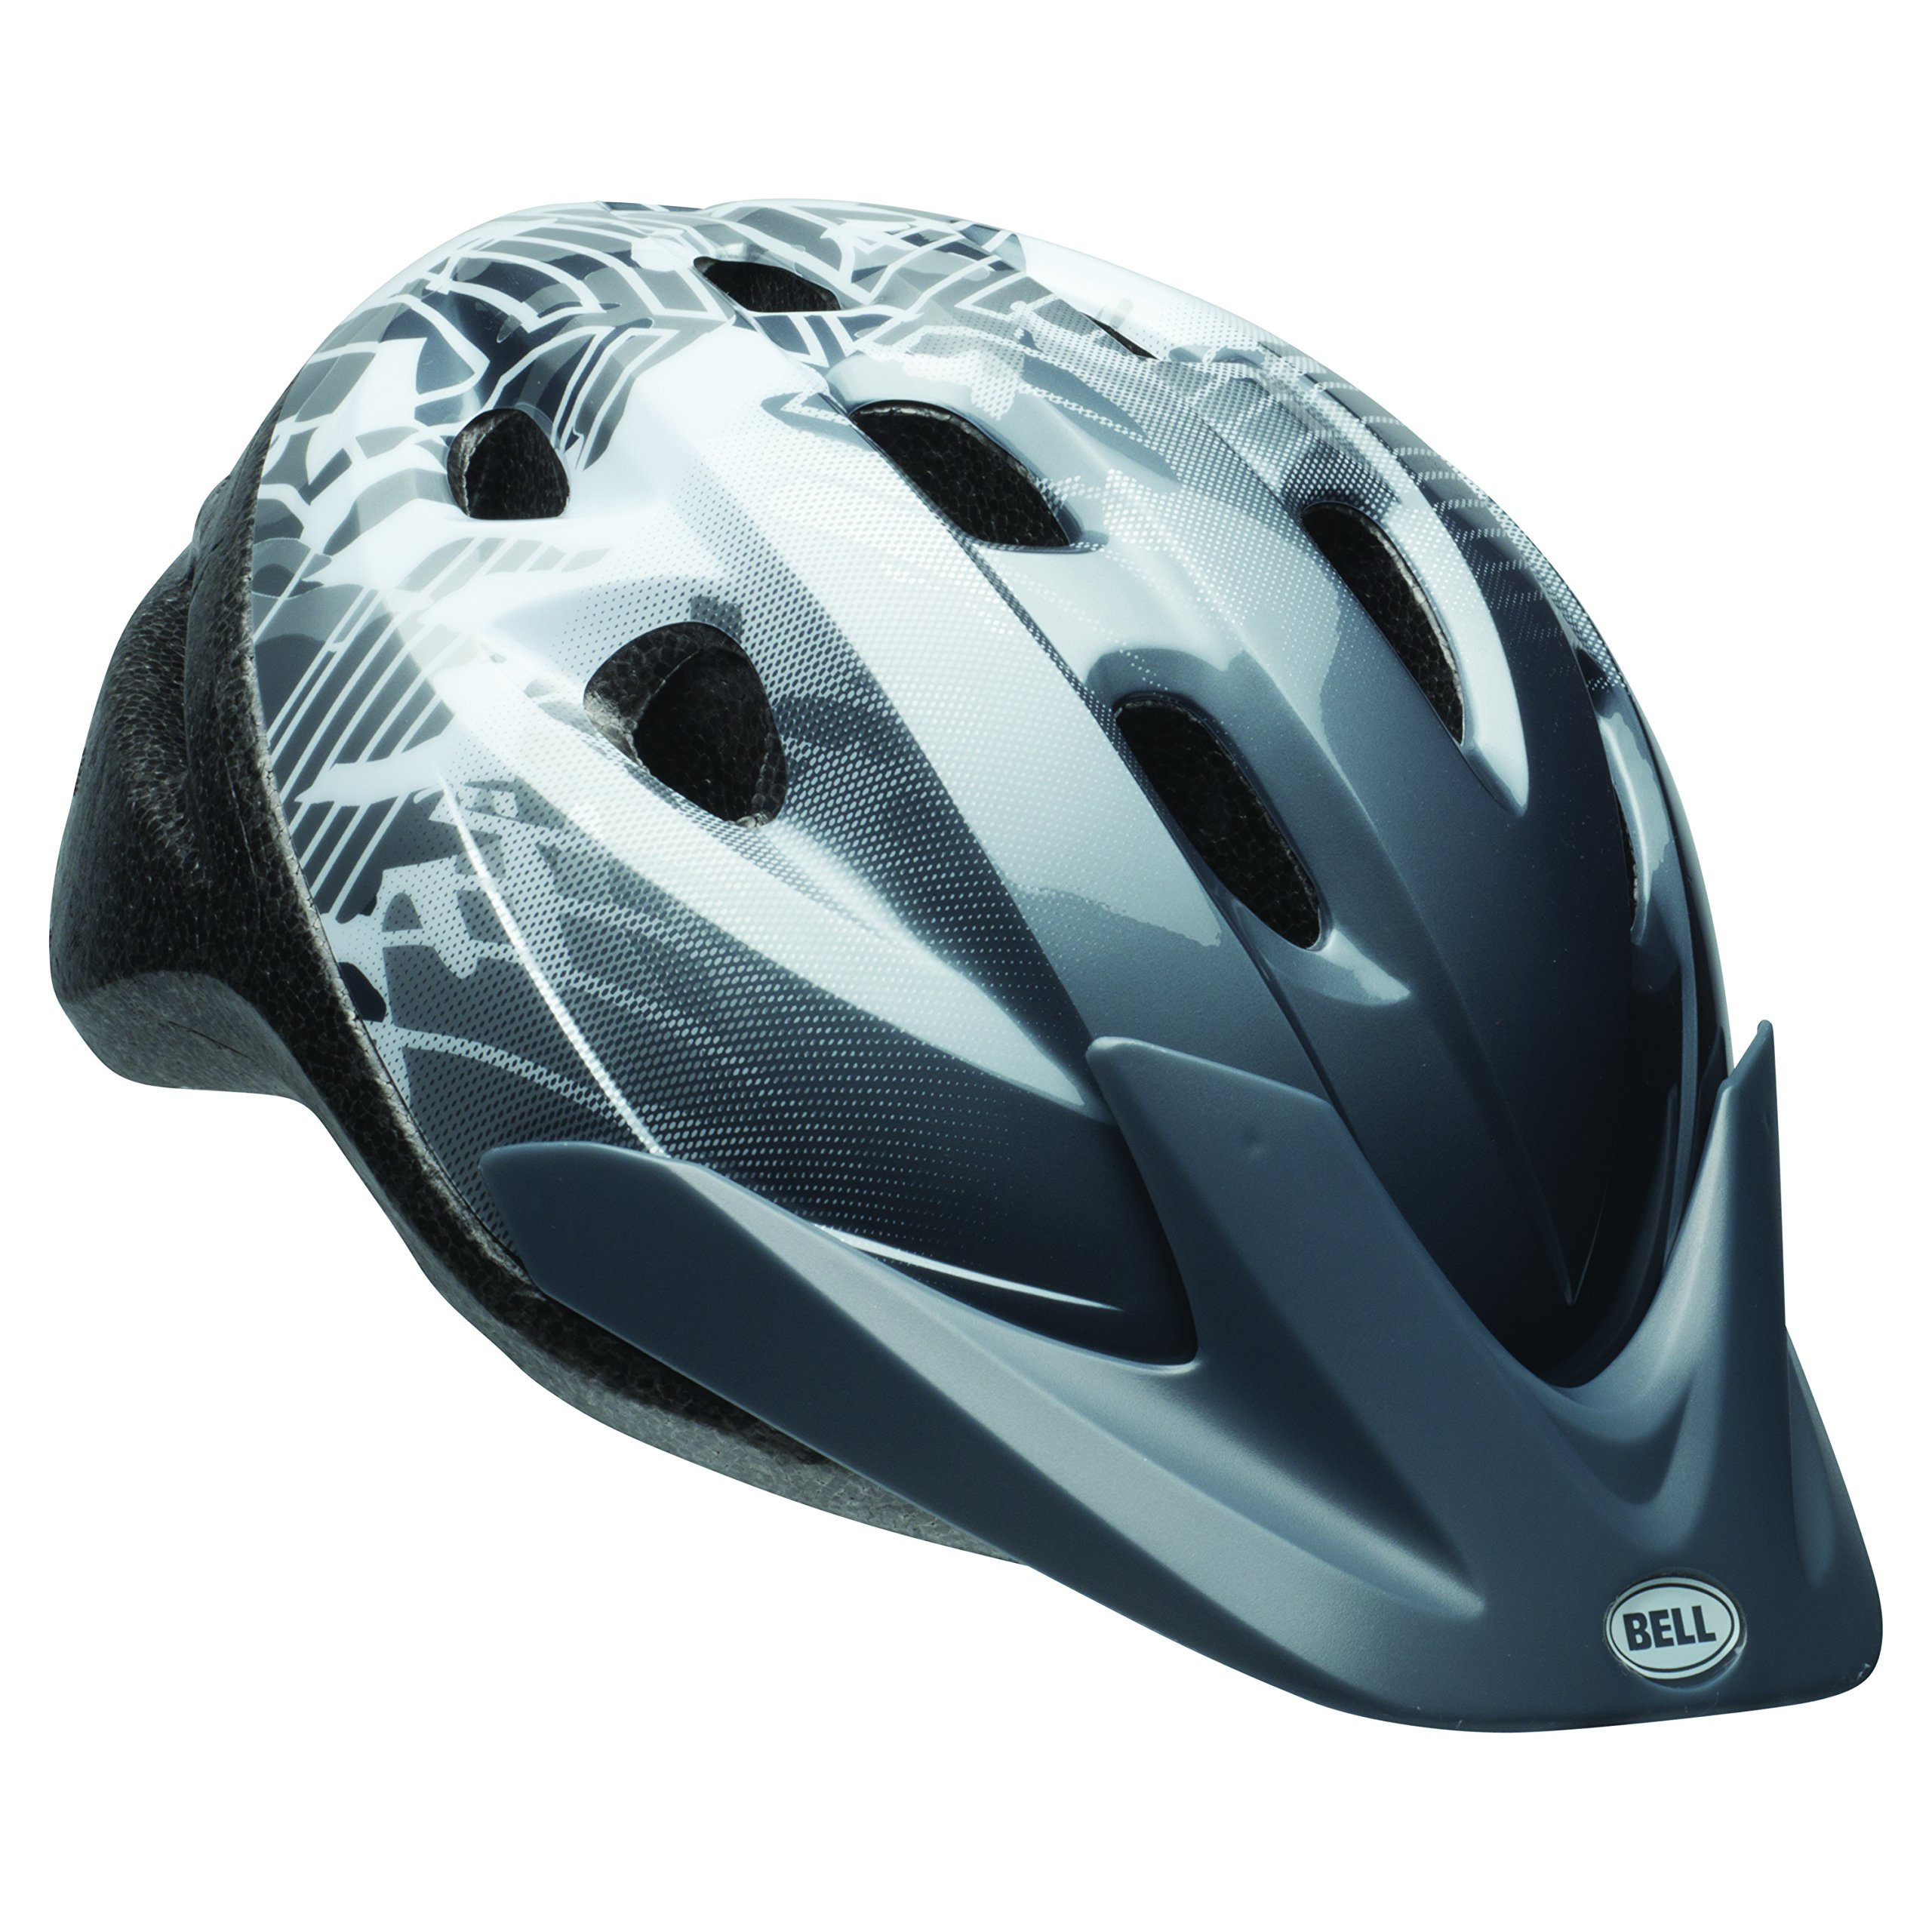 Bell Rally Bike Helmet - Dark Titanium & White